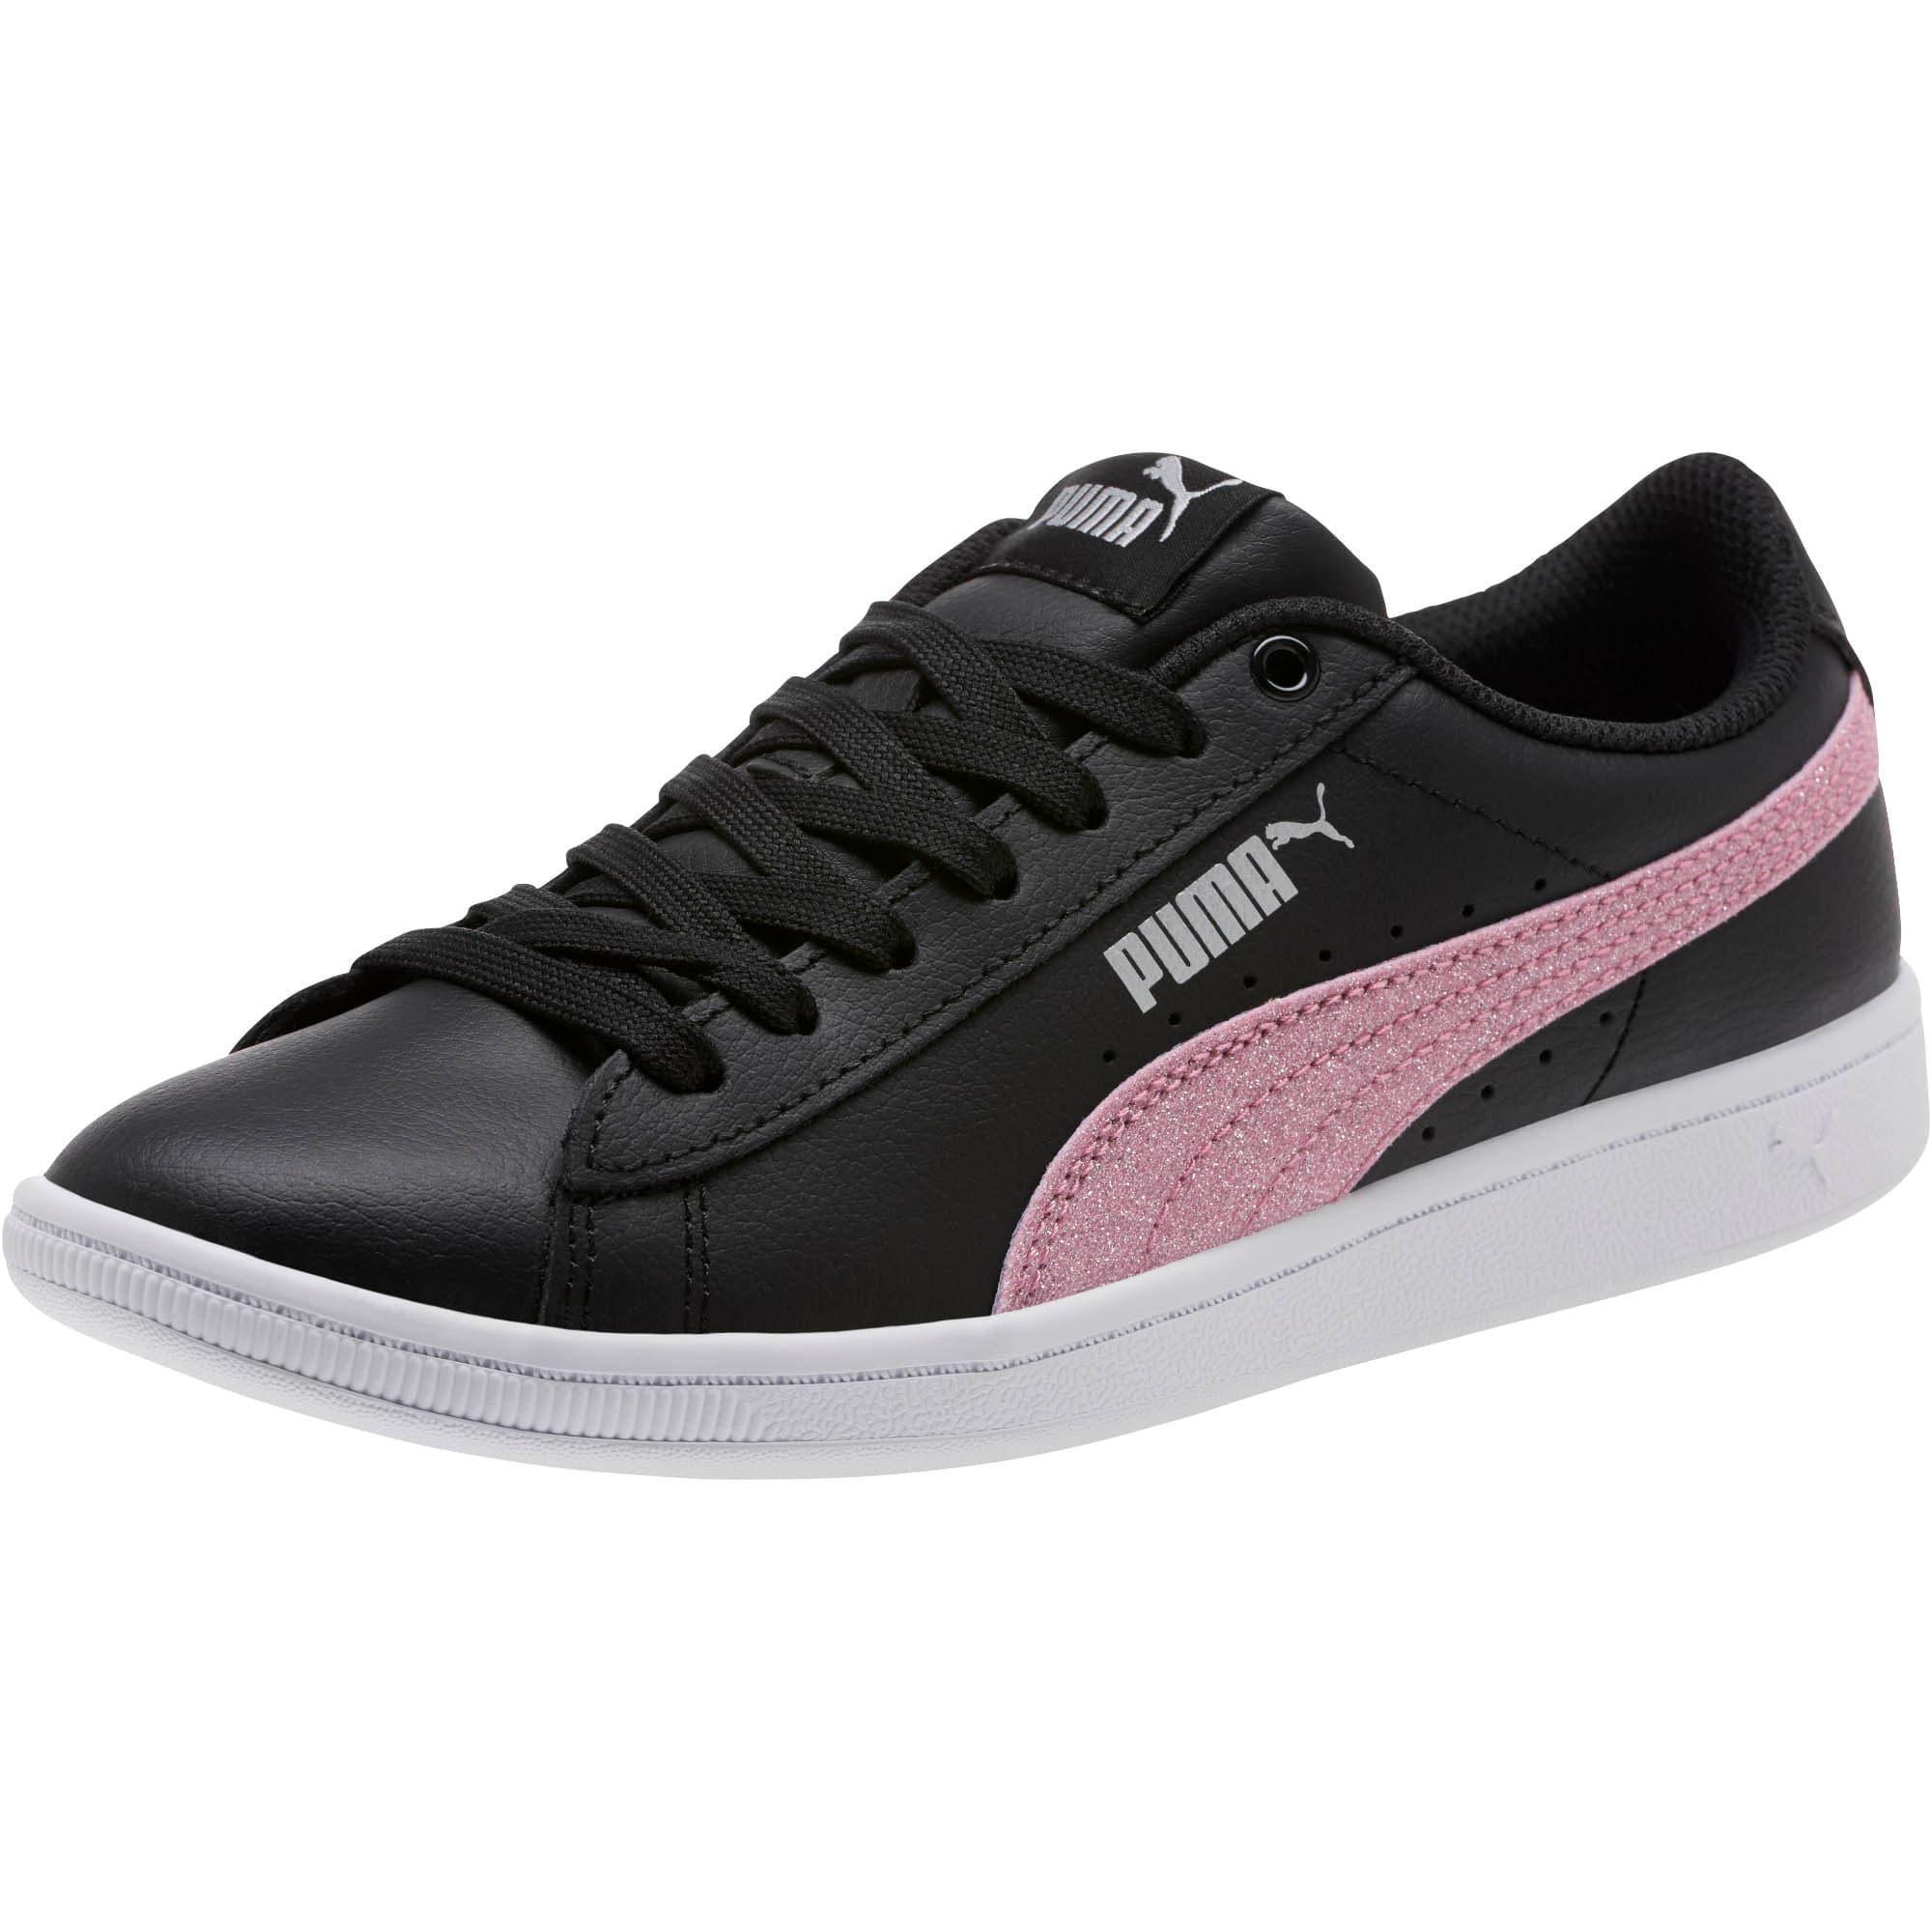 Thumbnail 1 of Puma Vikky Glitz FS Sneakers JR, Black-Orchid-Silver, medium